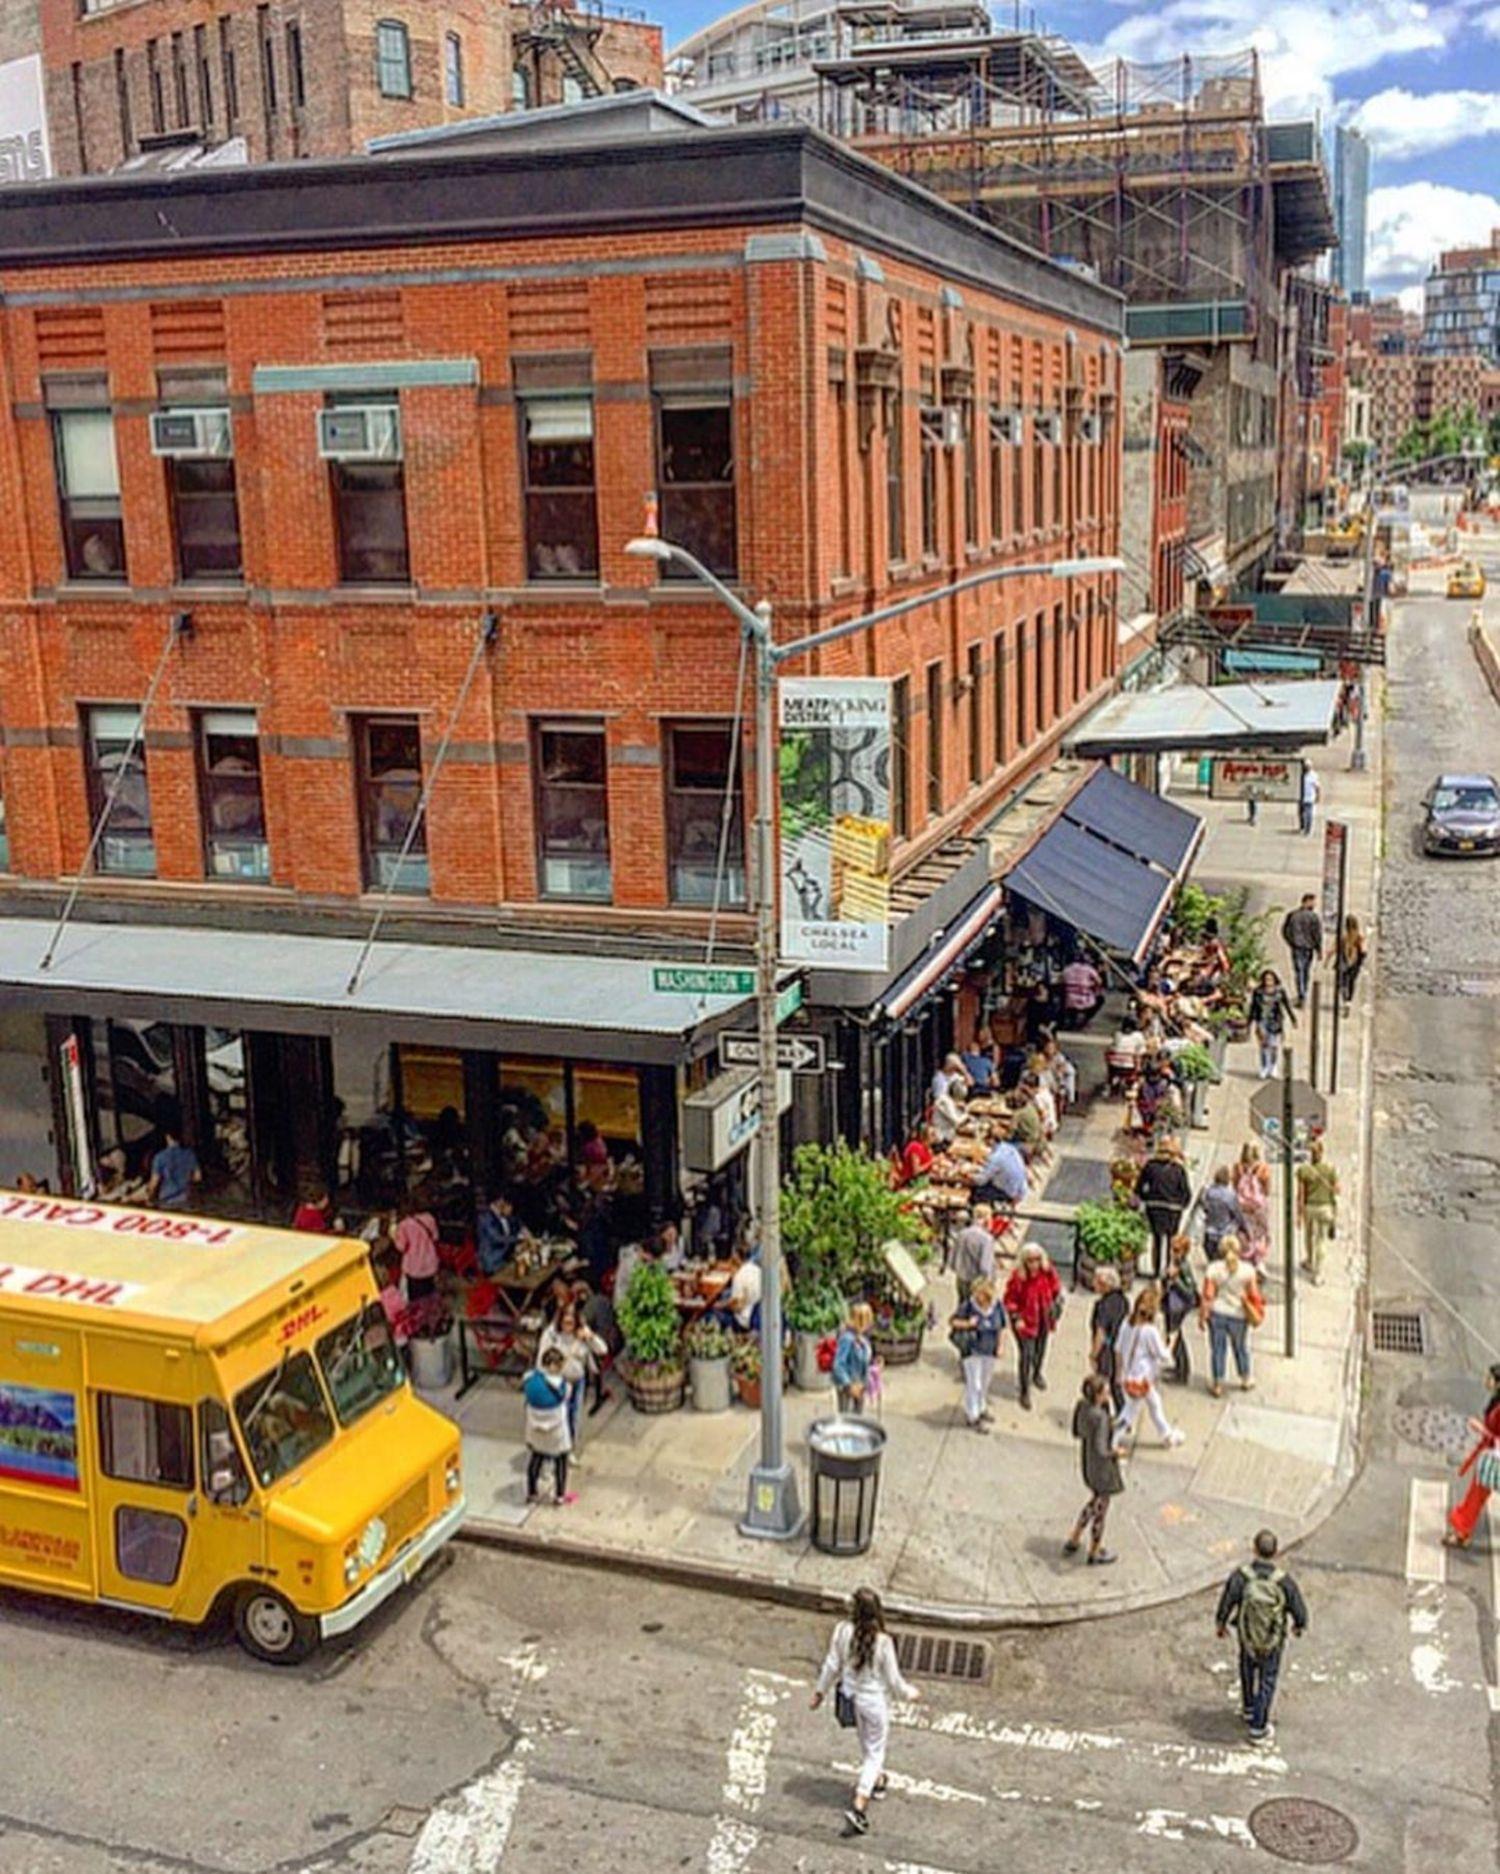 Corner of Washington Street and Gansevoort Street in Meatpacking District